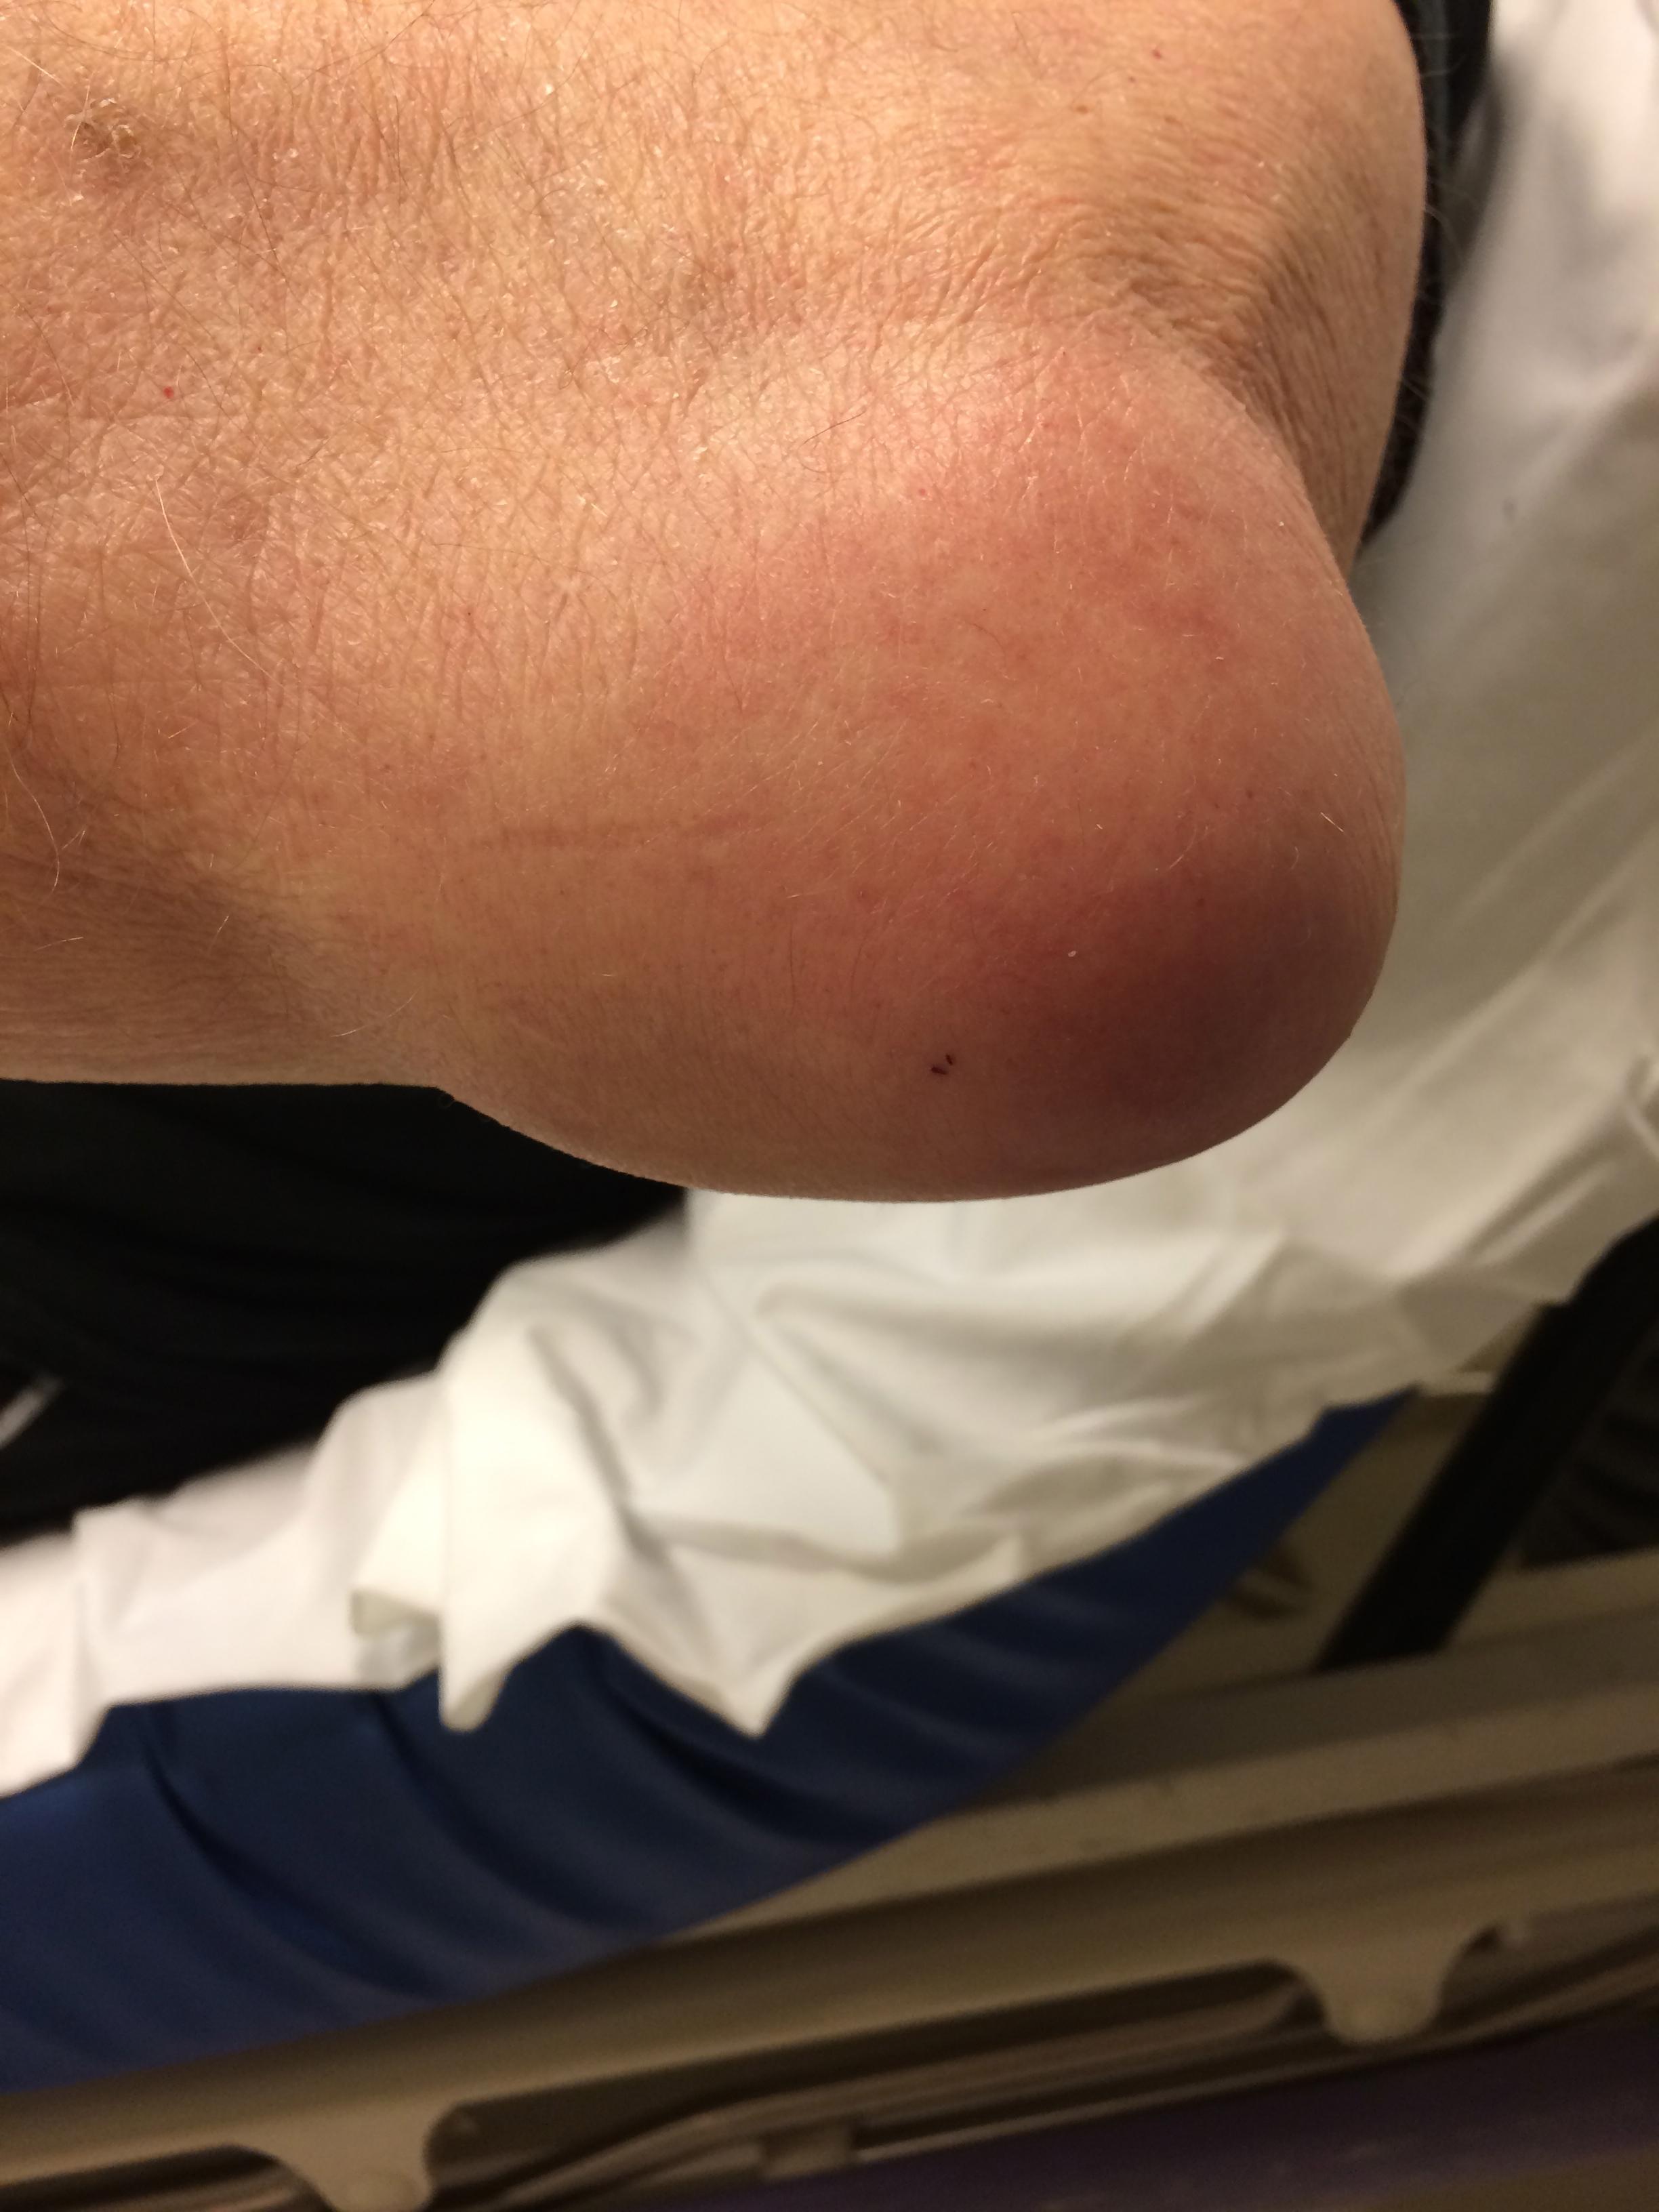 how to avoid bursitis elbow